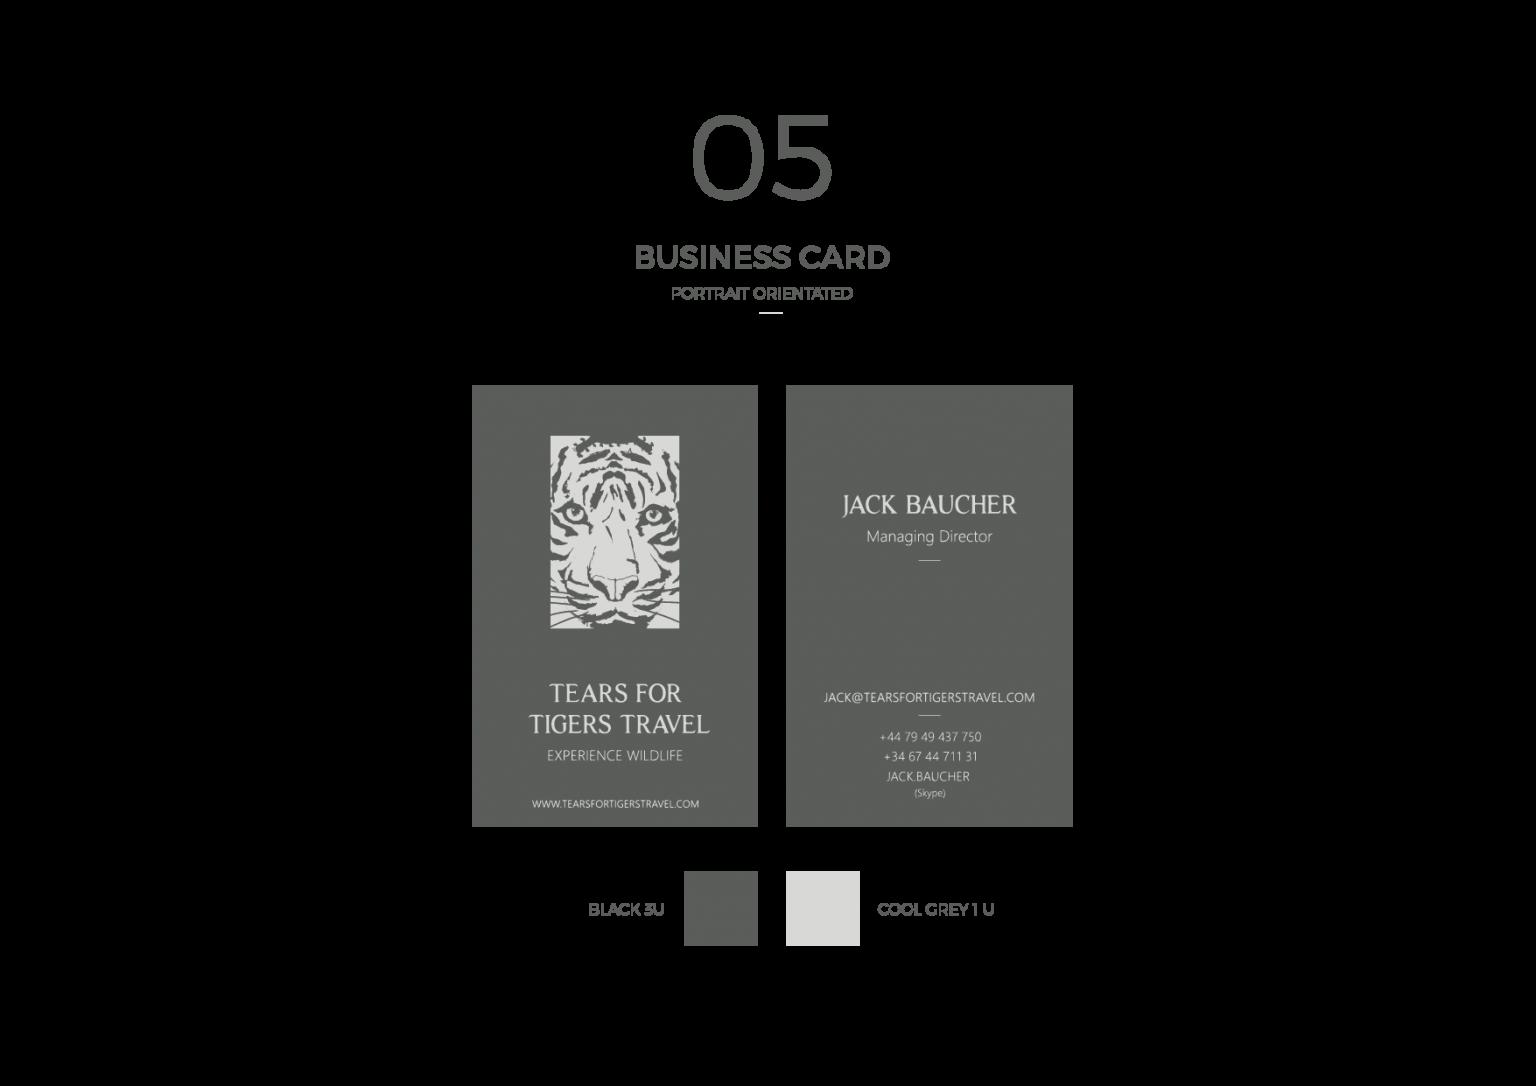 p06_BRANDBOOK-ILLUSTRATOR_FINAL_FLATTENED_05-BUSINESS-CARD-1536x1086